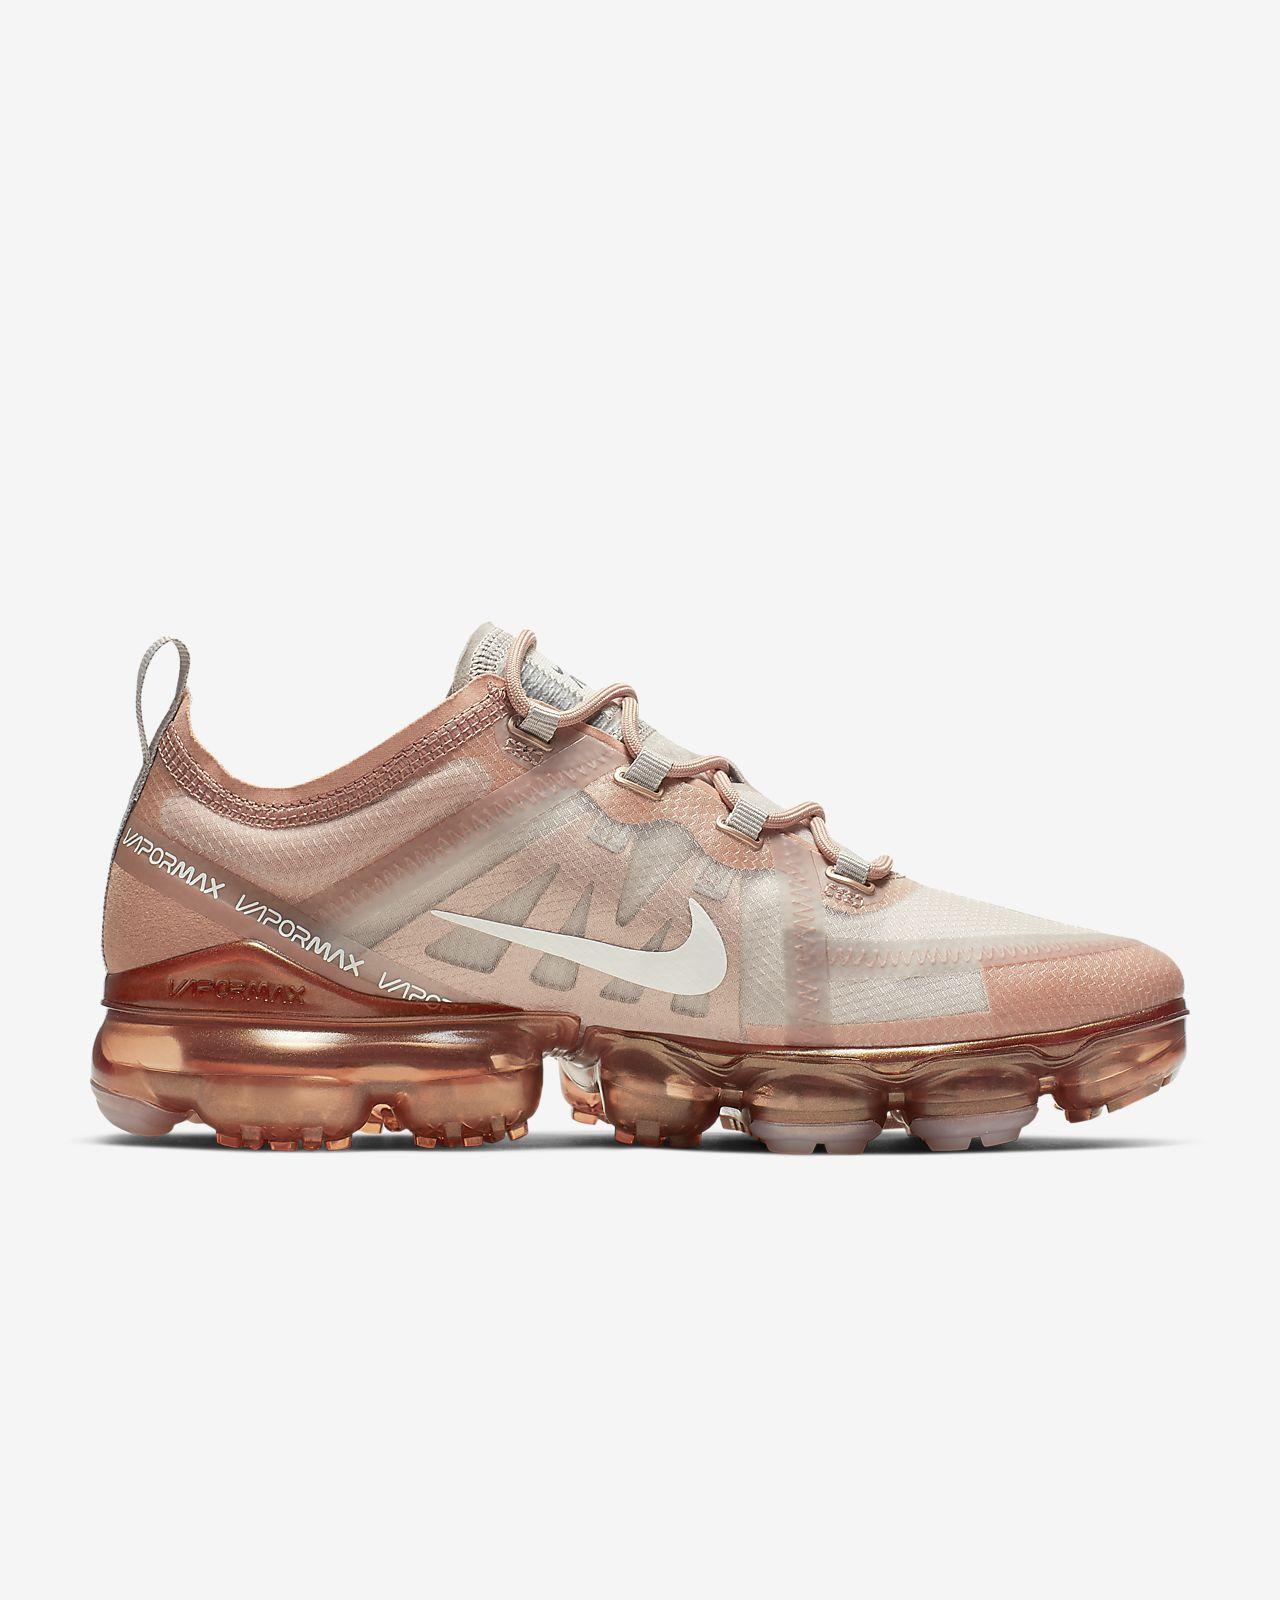 f45d5593fdc91 Nike Air VaporMax 2019 womens fashion clothing shoes